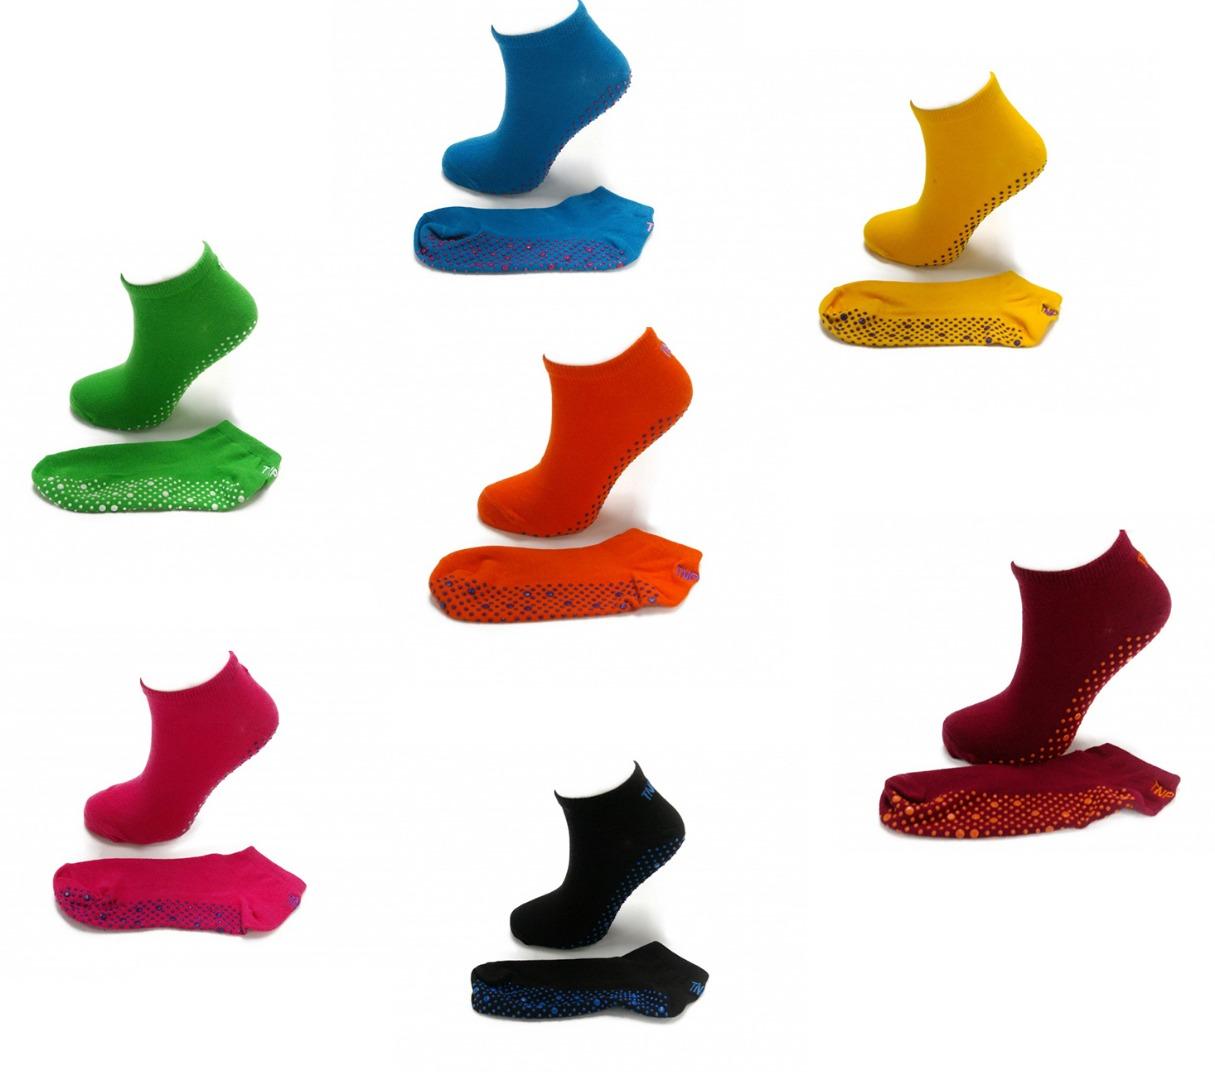 Pilates Yoga Fitness Dance Gym Anti Slip Non Slip Massage Grip Socks